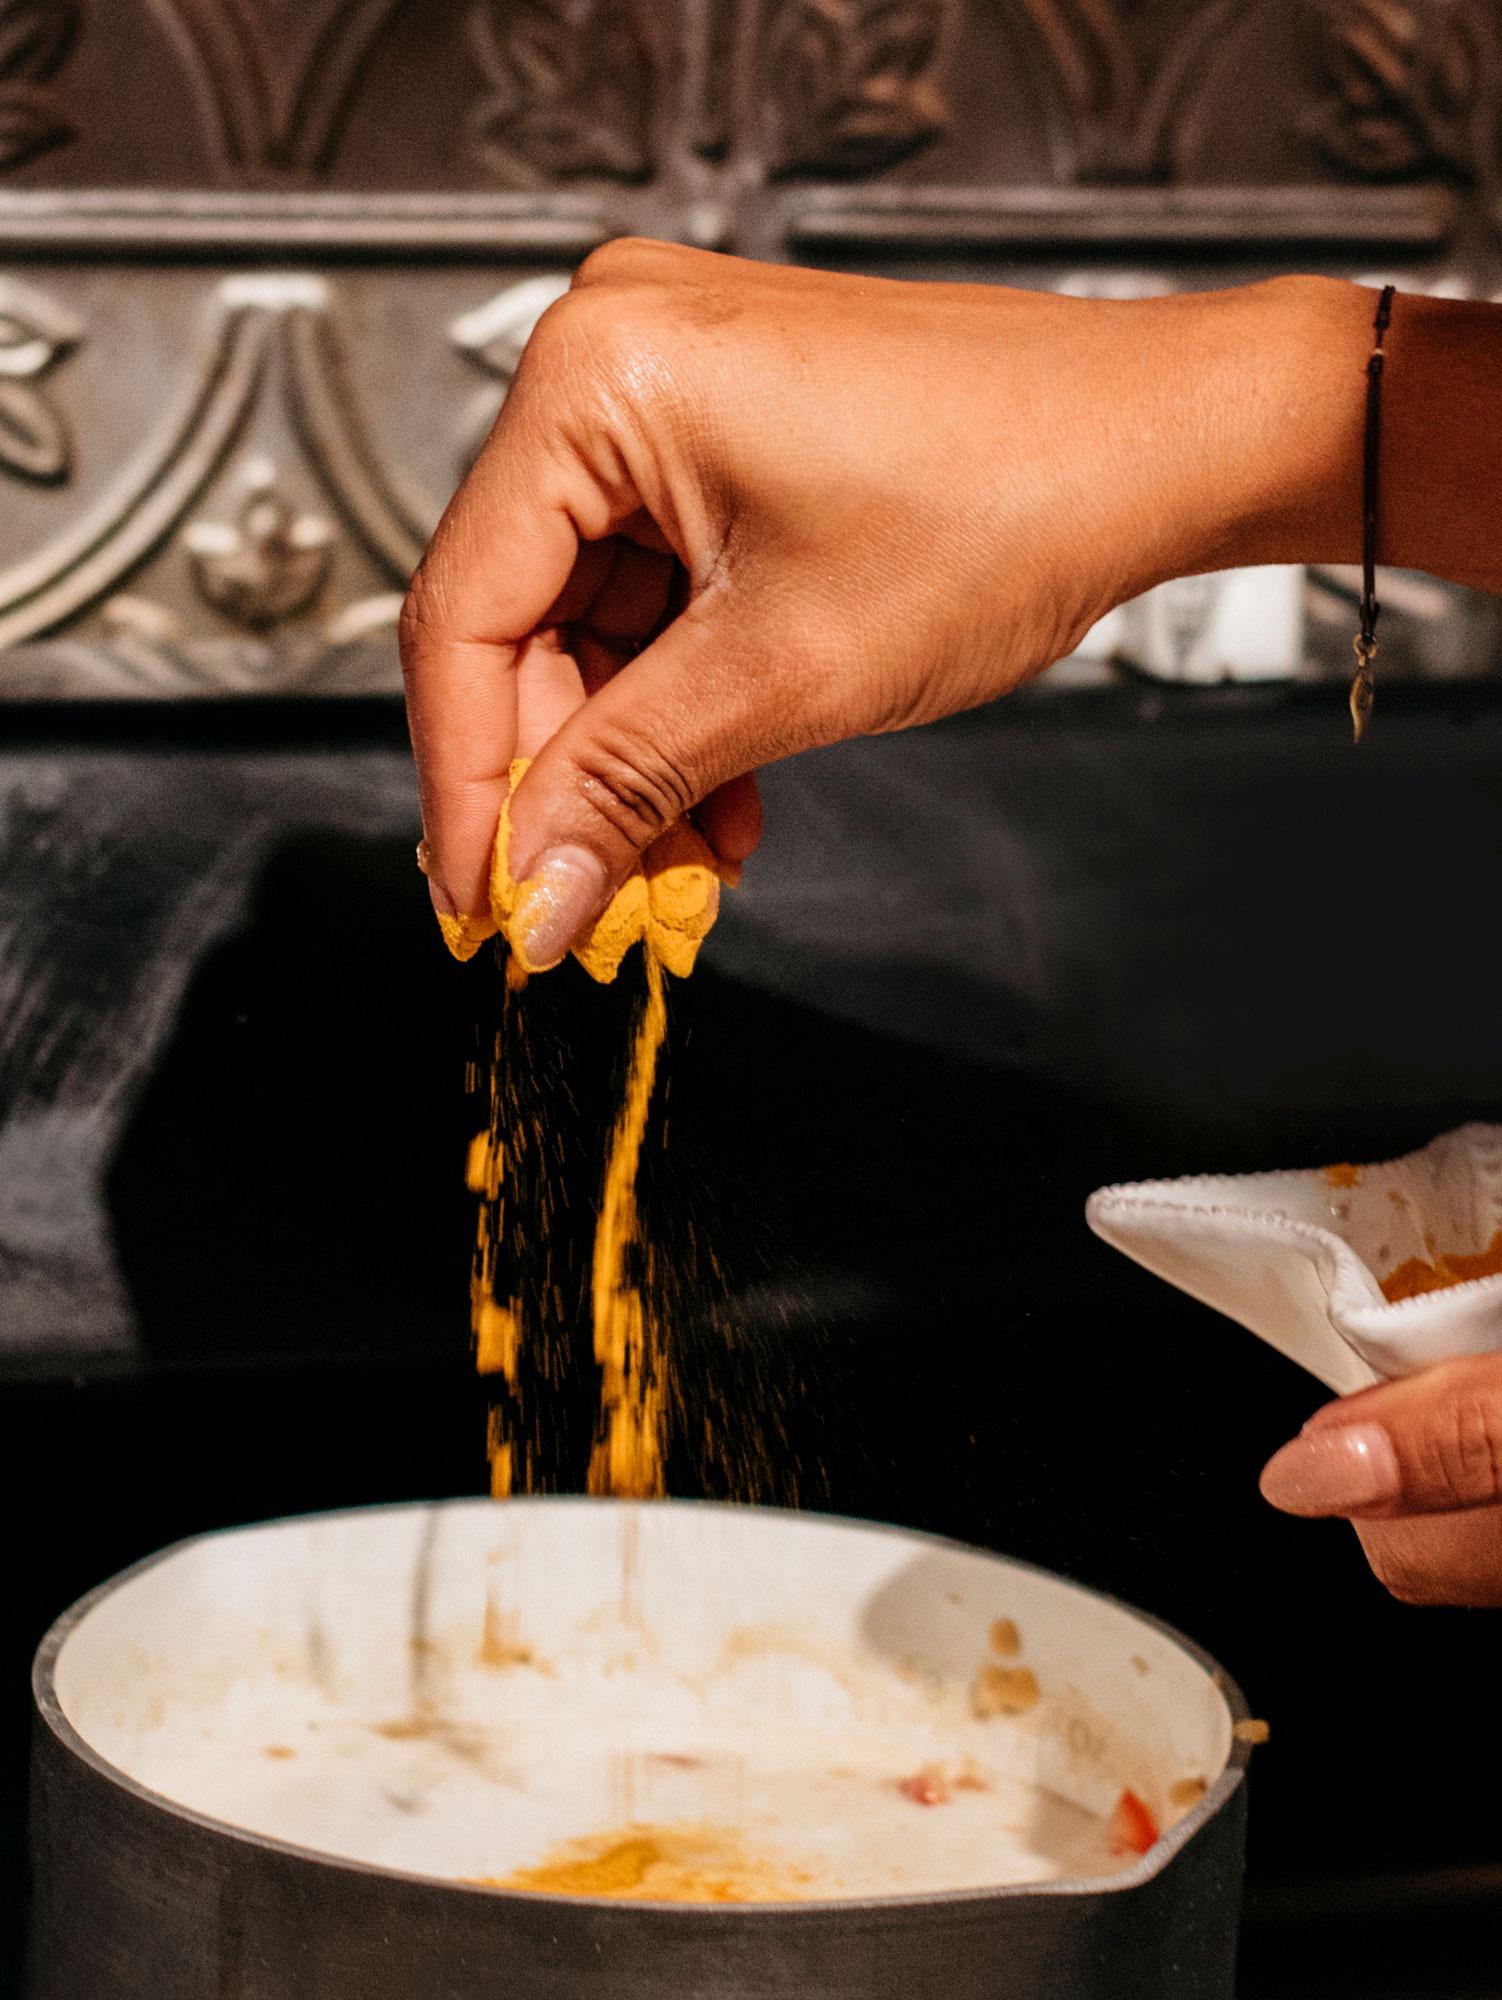 Los_Angeles_Food_photographer_Rebecca_Peloquin_Sri_Lankan_Food_005.JPG